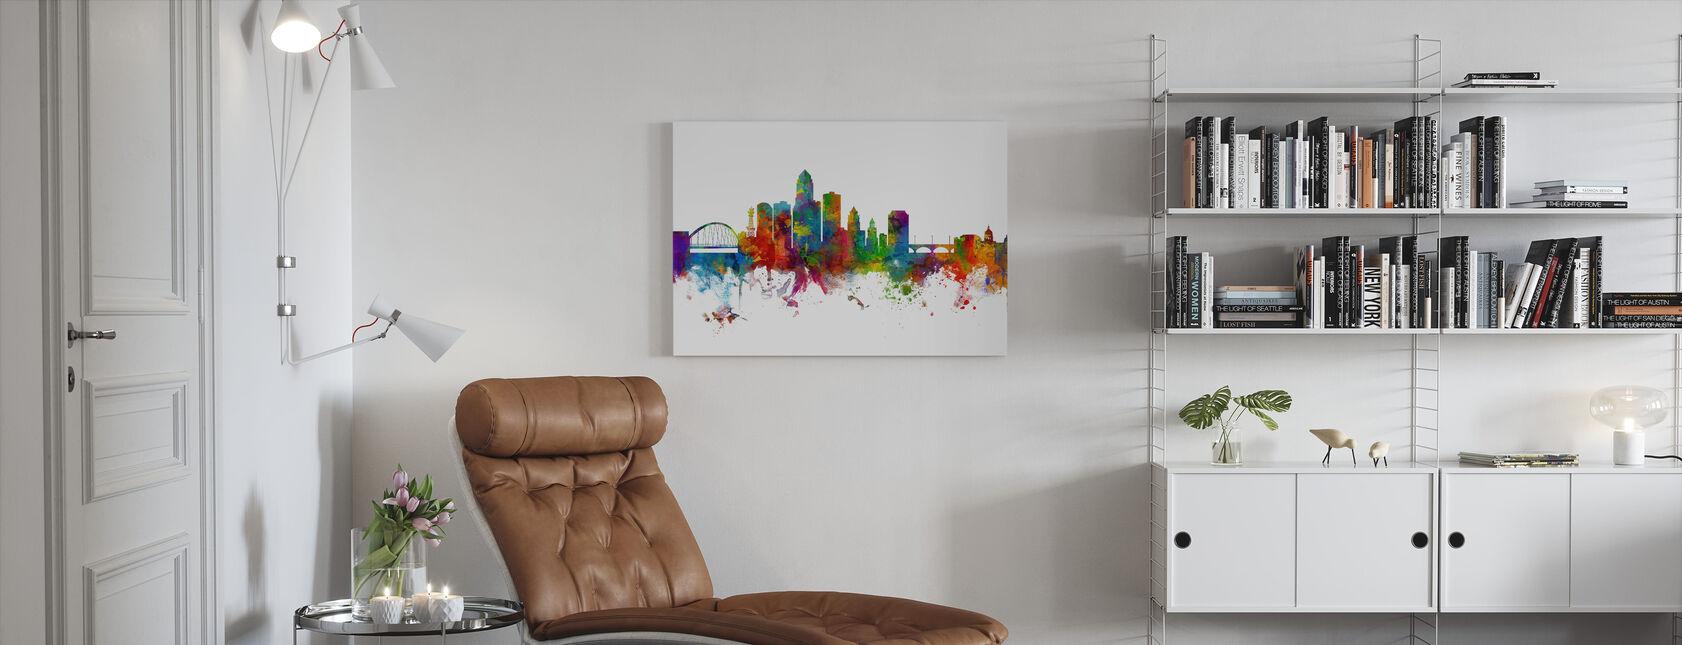 Des Moines Iowa Skyline - Canvas print - Living Room